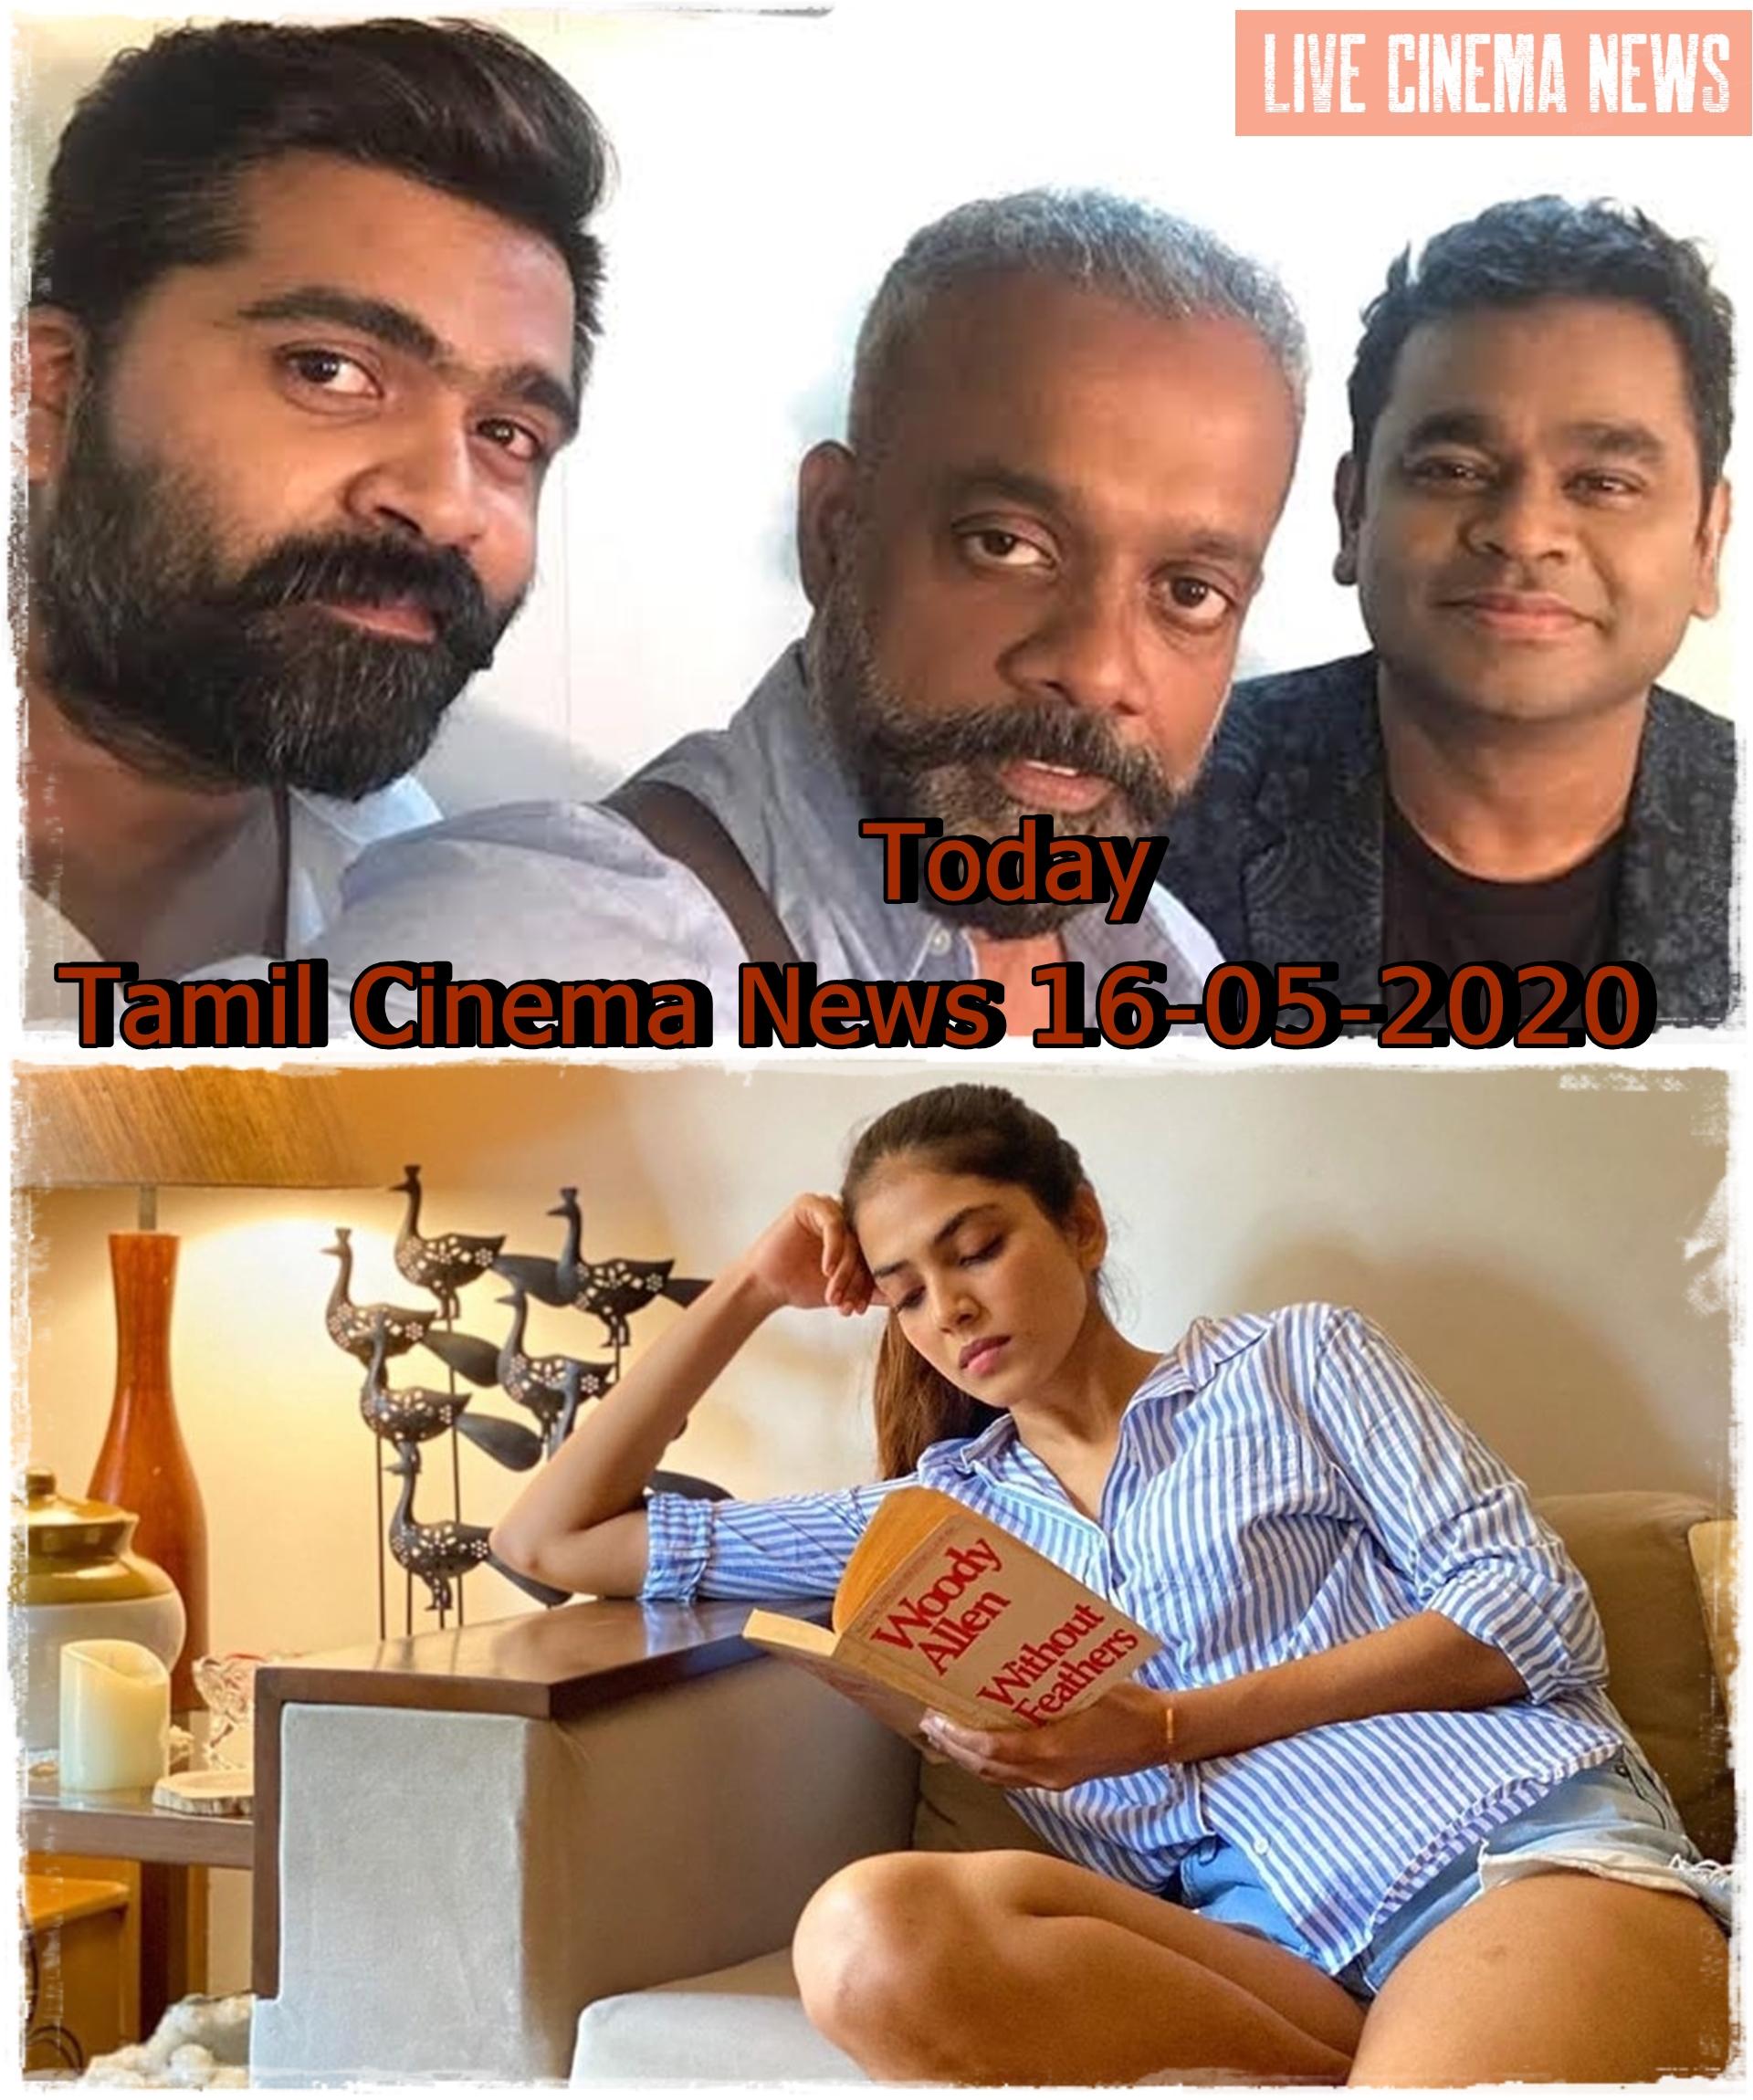 Today Tamil Cinema News 16-05-2020